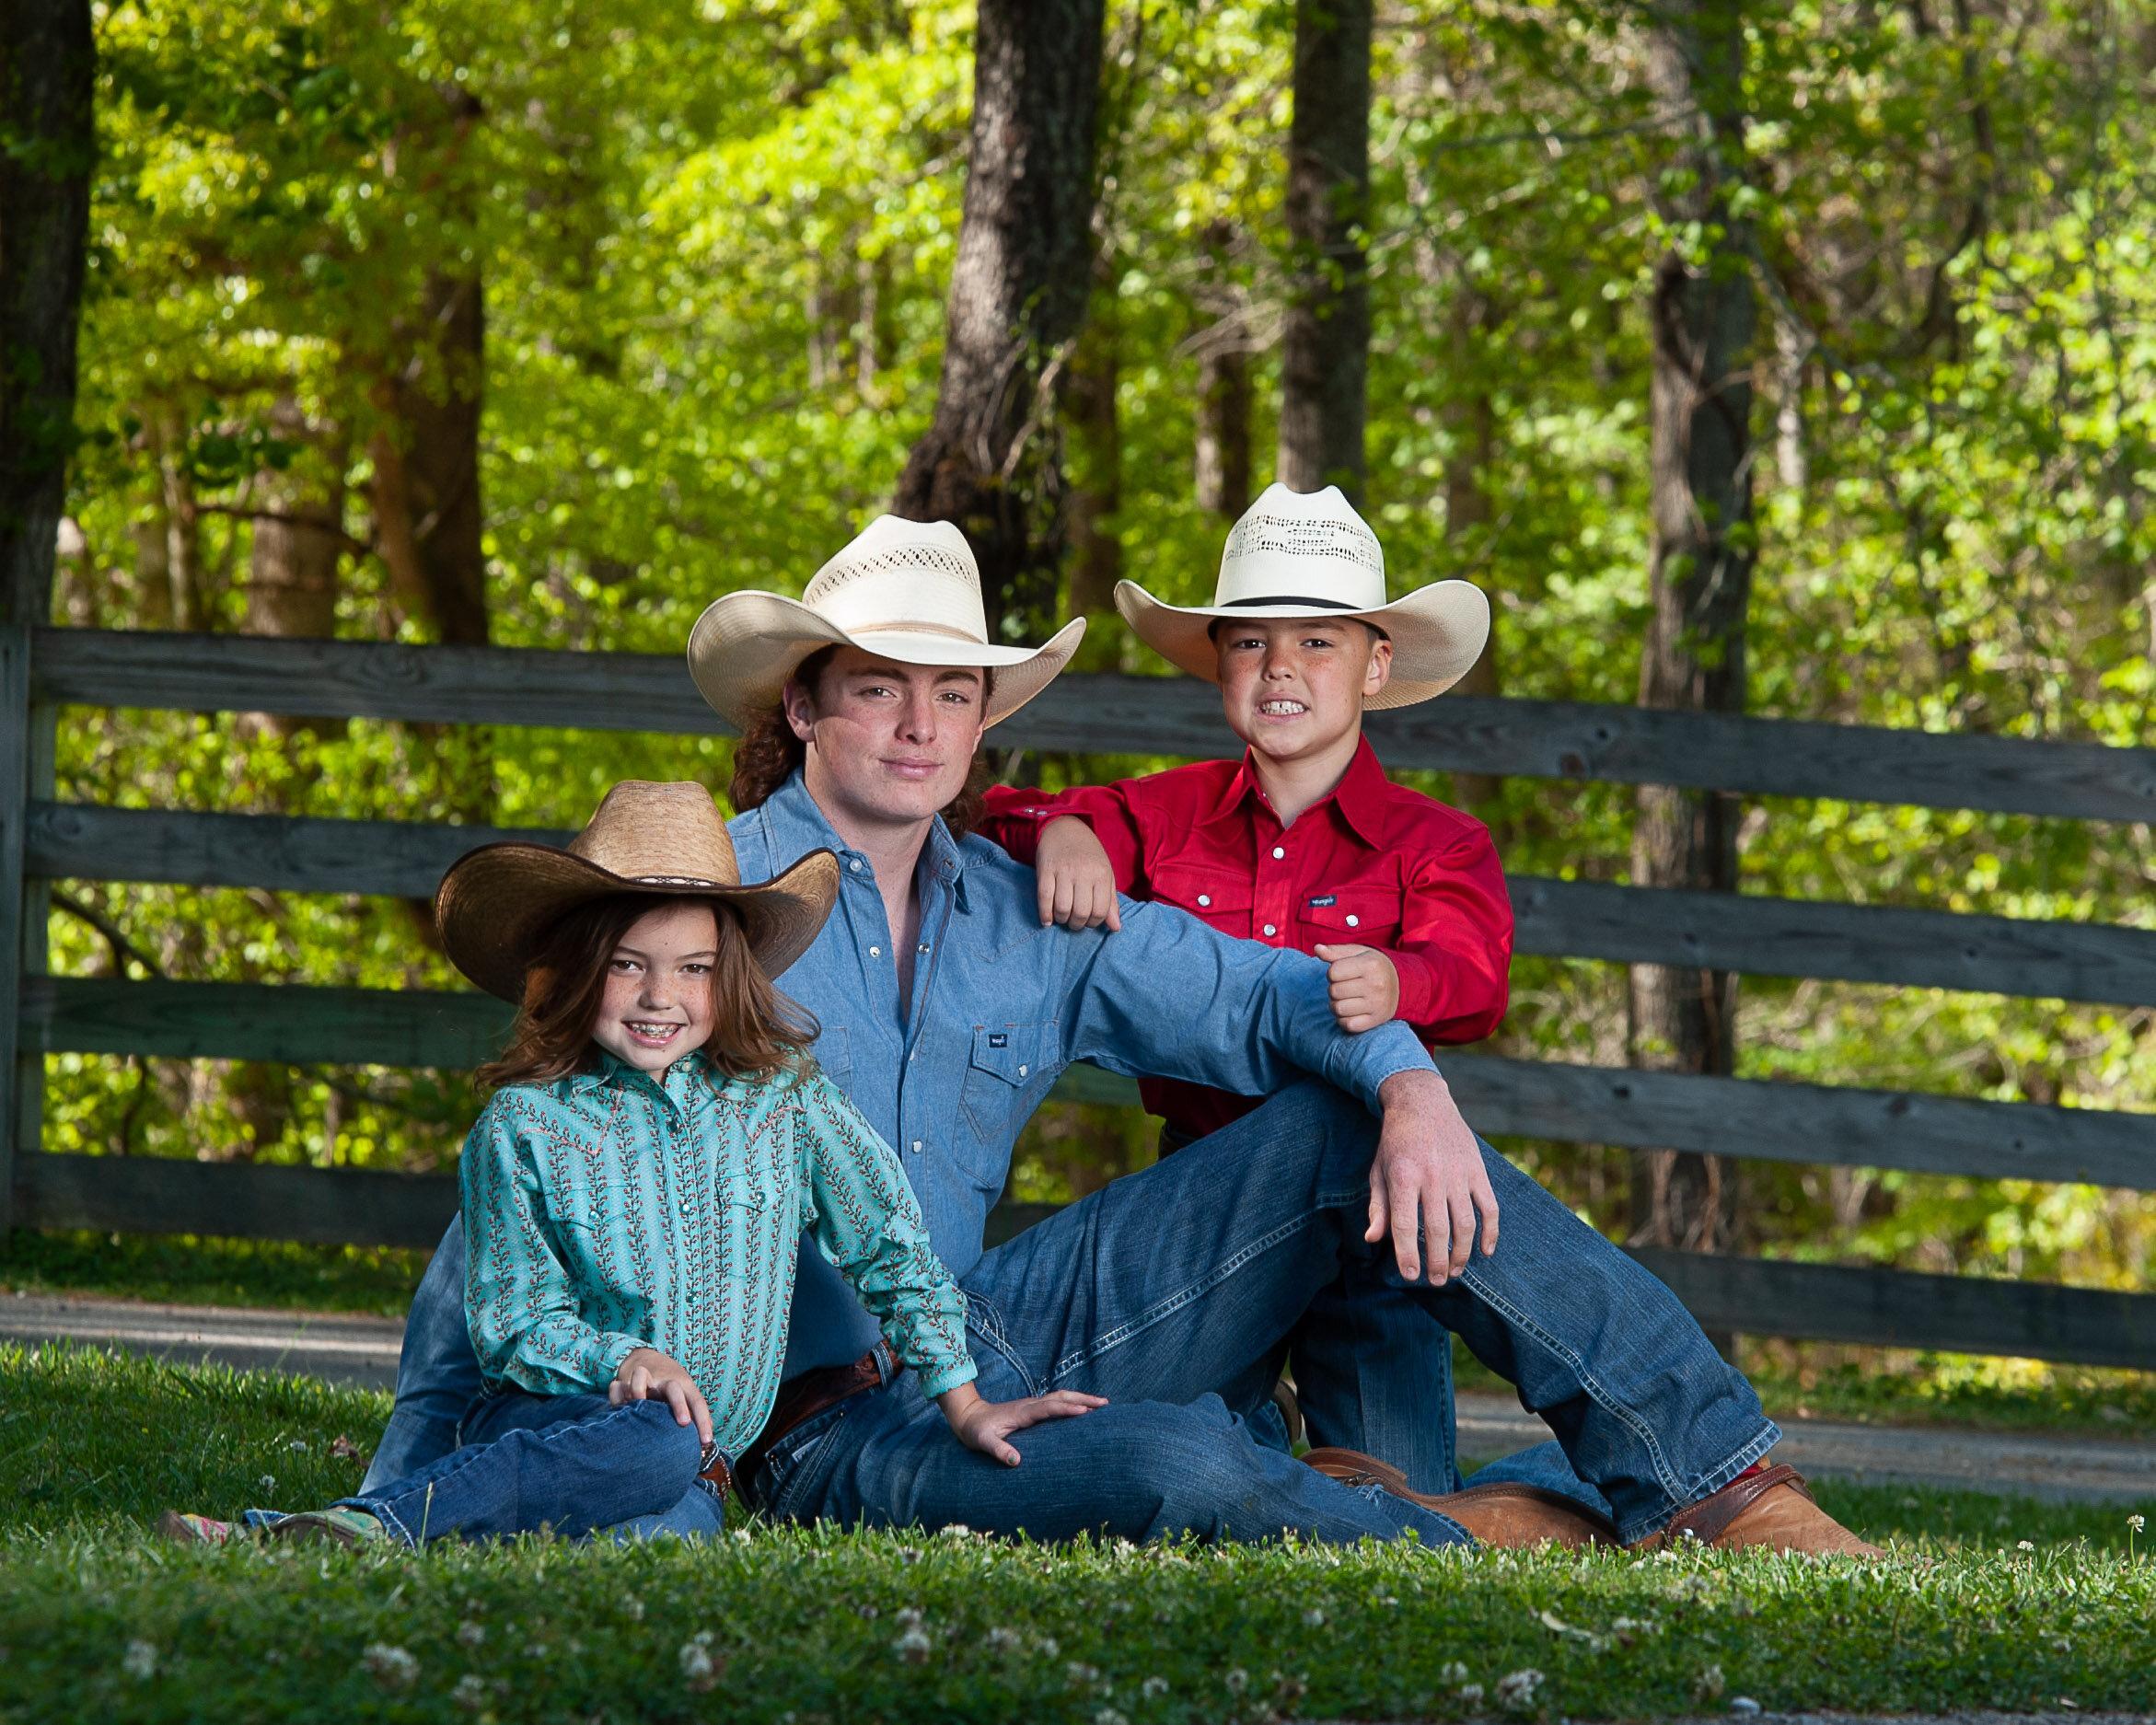 equestrianfamilyphotos.WesternEquestrian.KevinLambPhotography.-7248.jpg